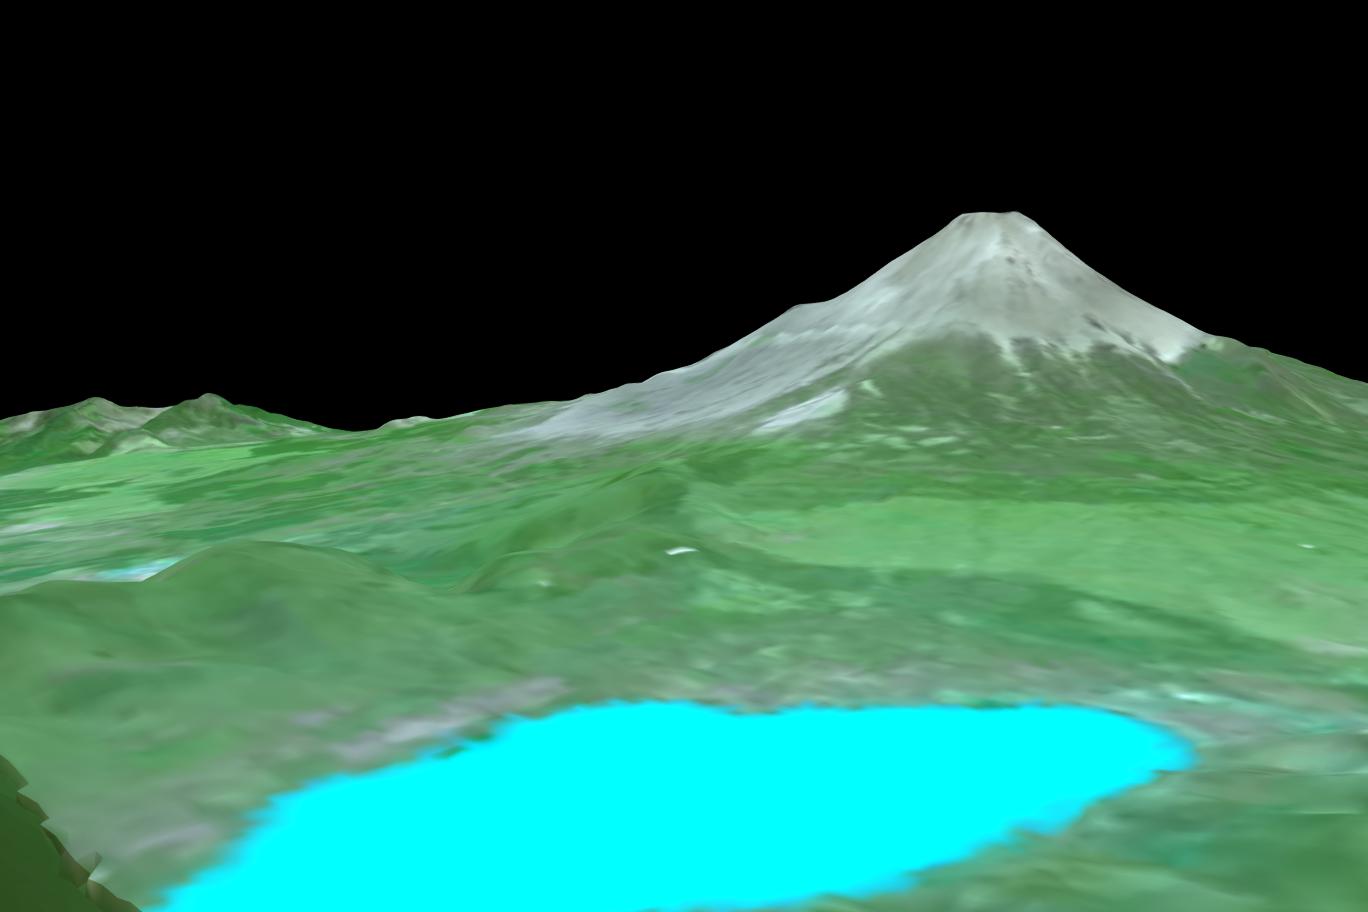 3Dモデル山